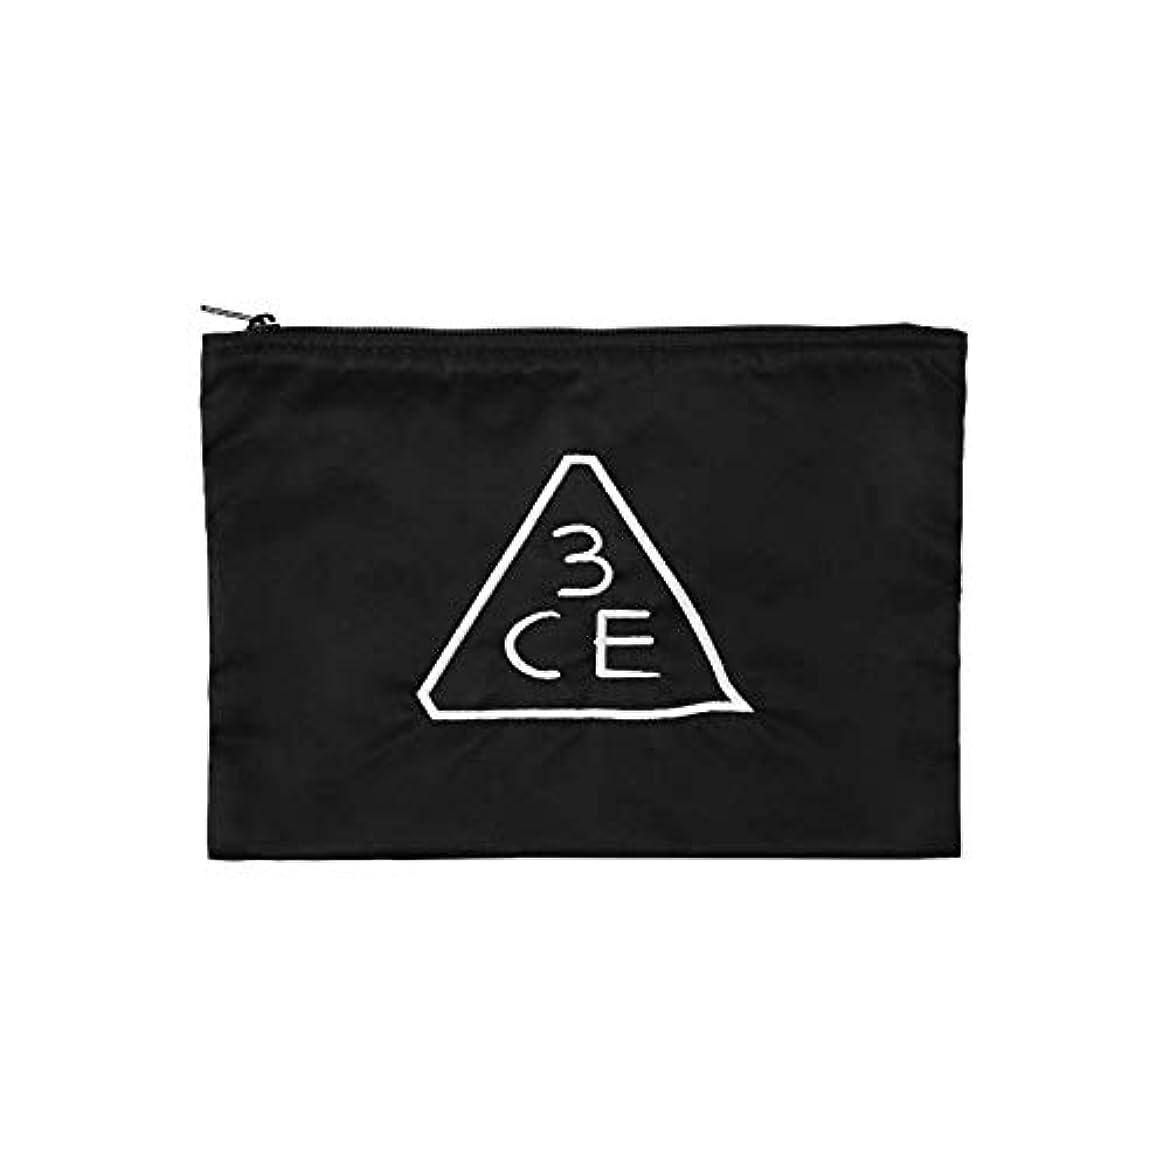 3CE フラットポーチ FLAT POUCH MEDIUM #BLACK [並行輸入品]